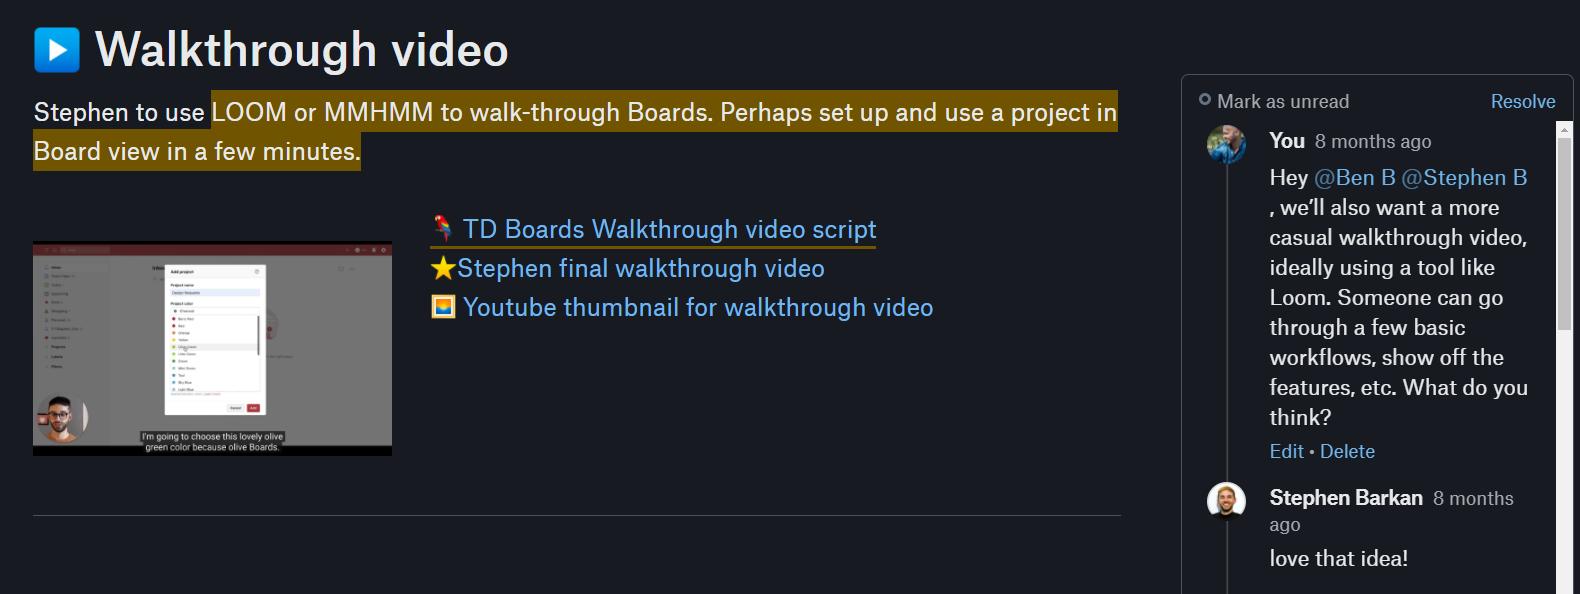 Screen grab of the walkthrough video on Twist